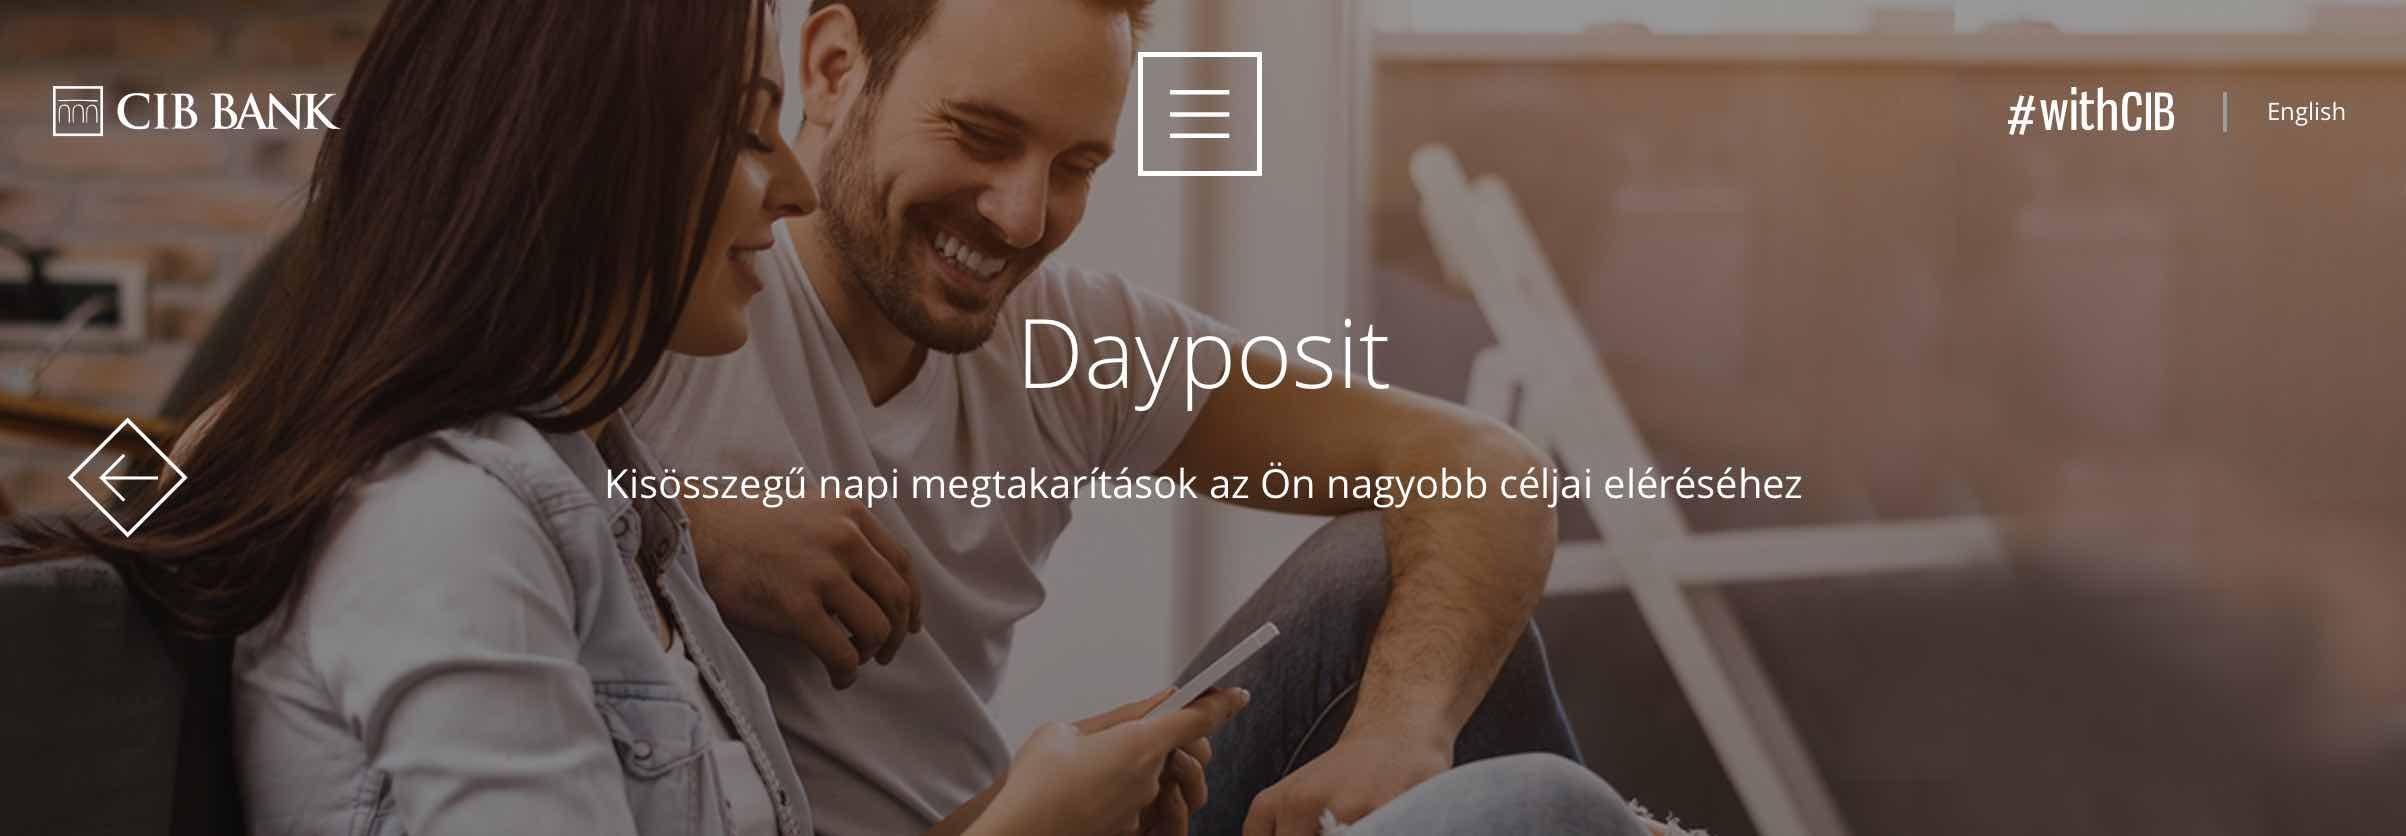 CIB mobilbank megtakaritas dayposit